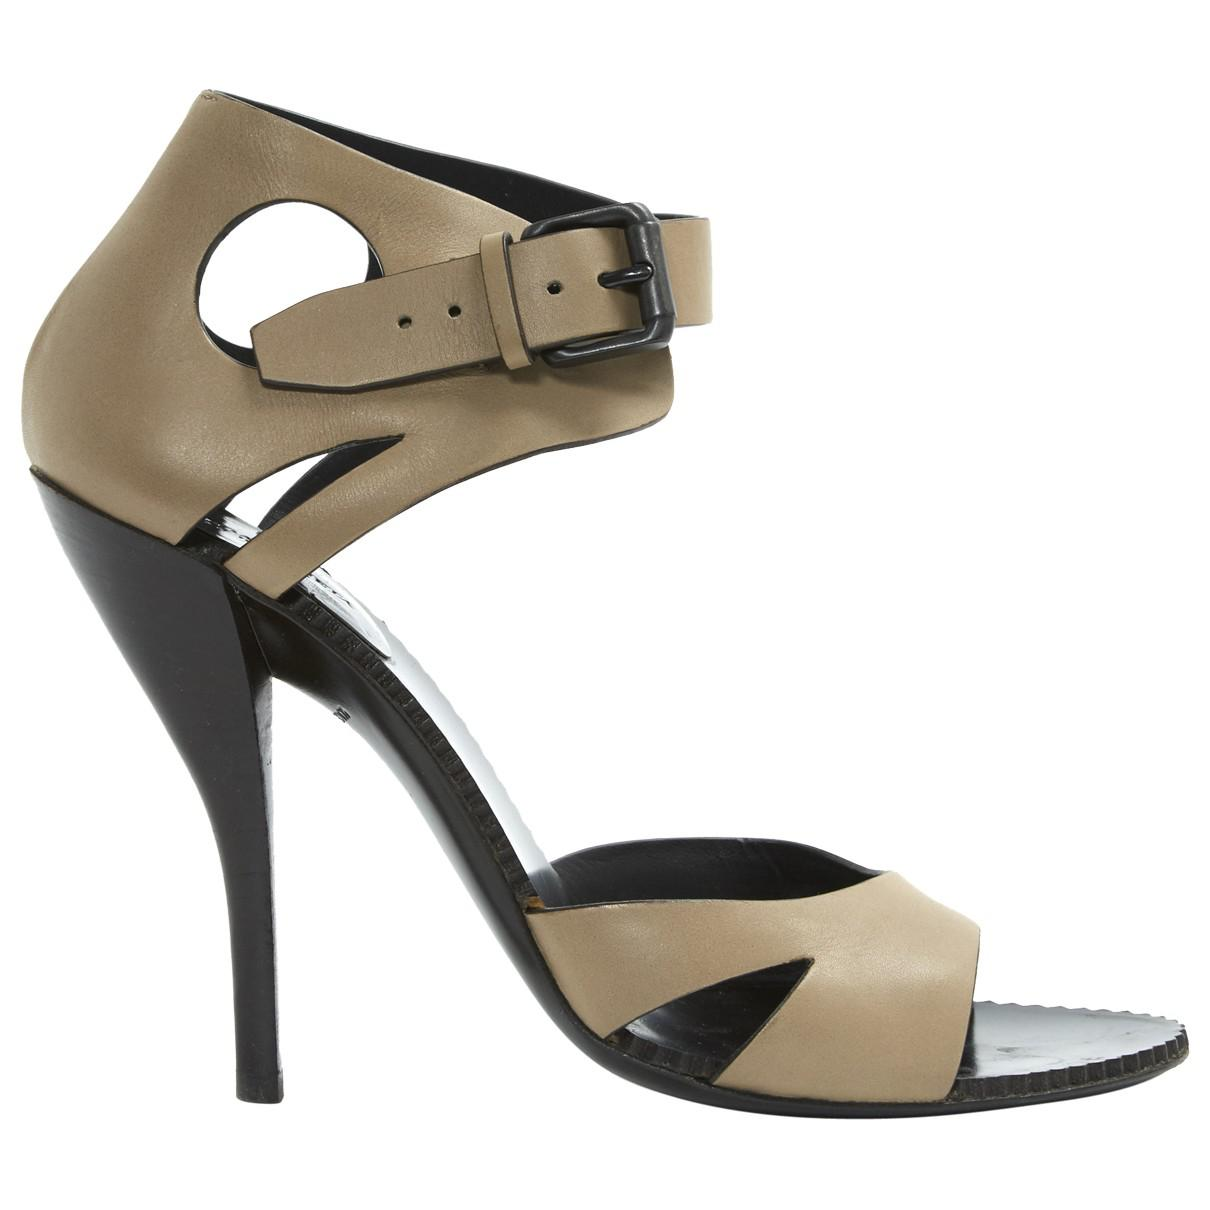 Pre-owned - Leather sandals Bottega Veneta gf5Em